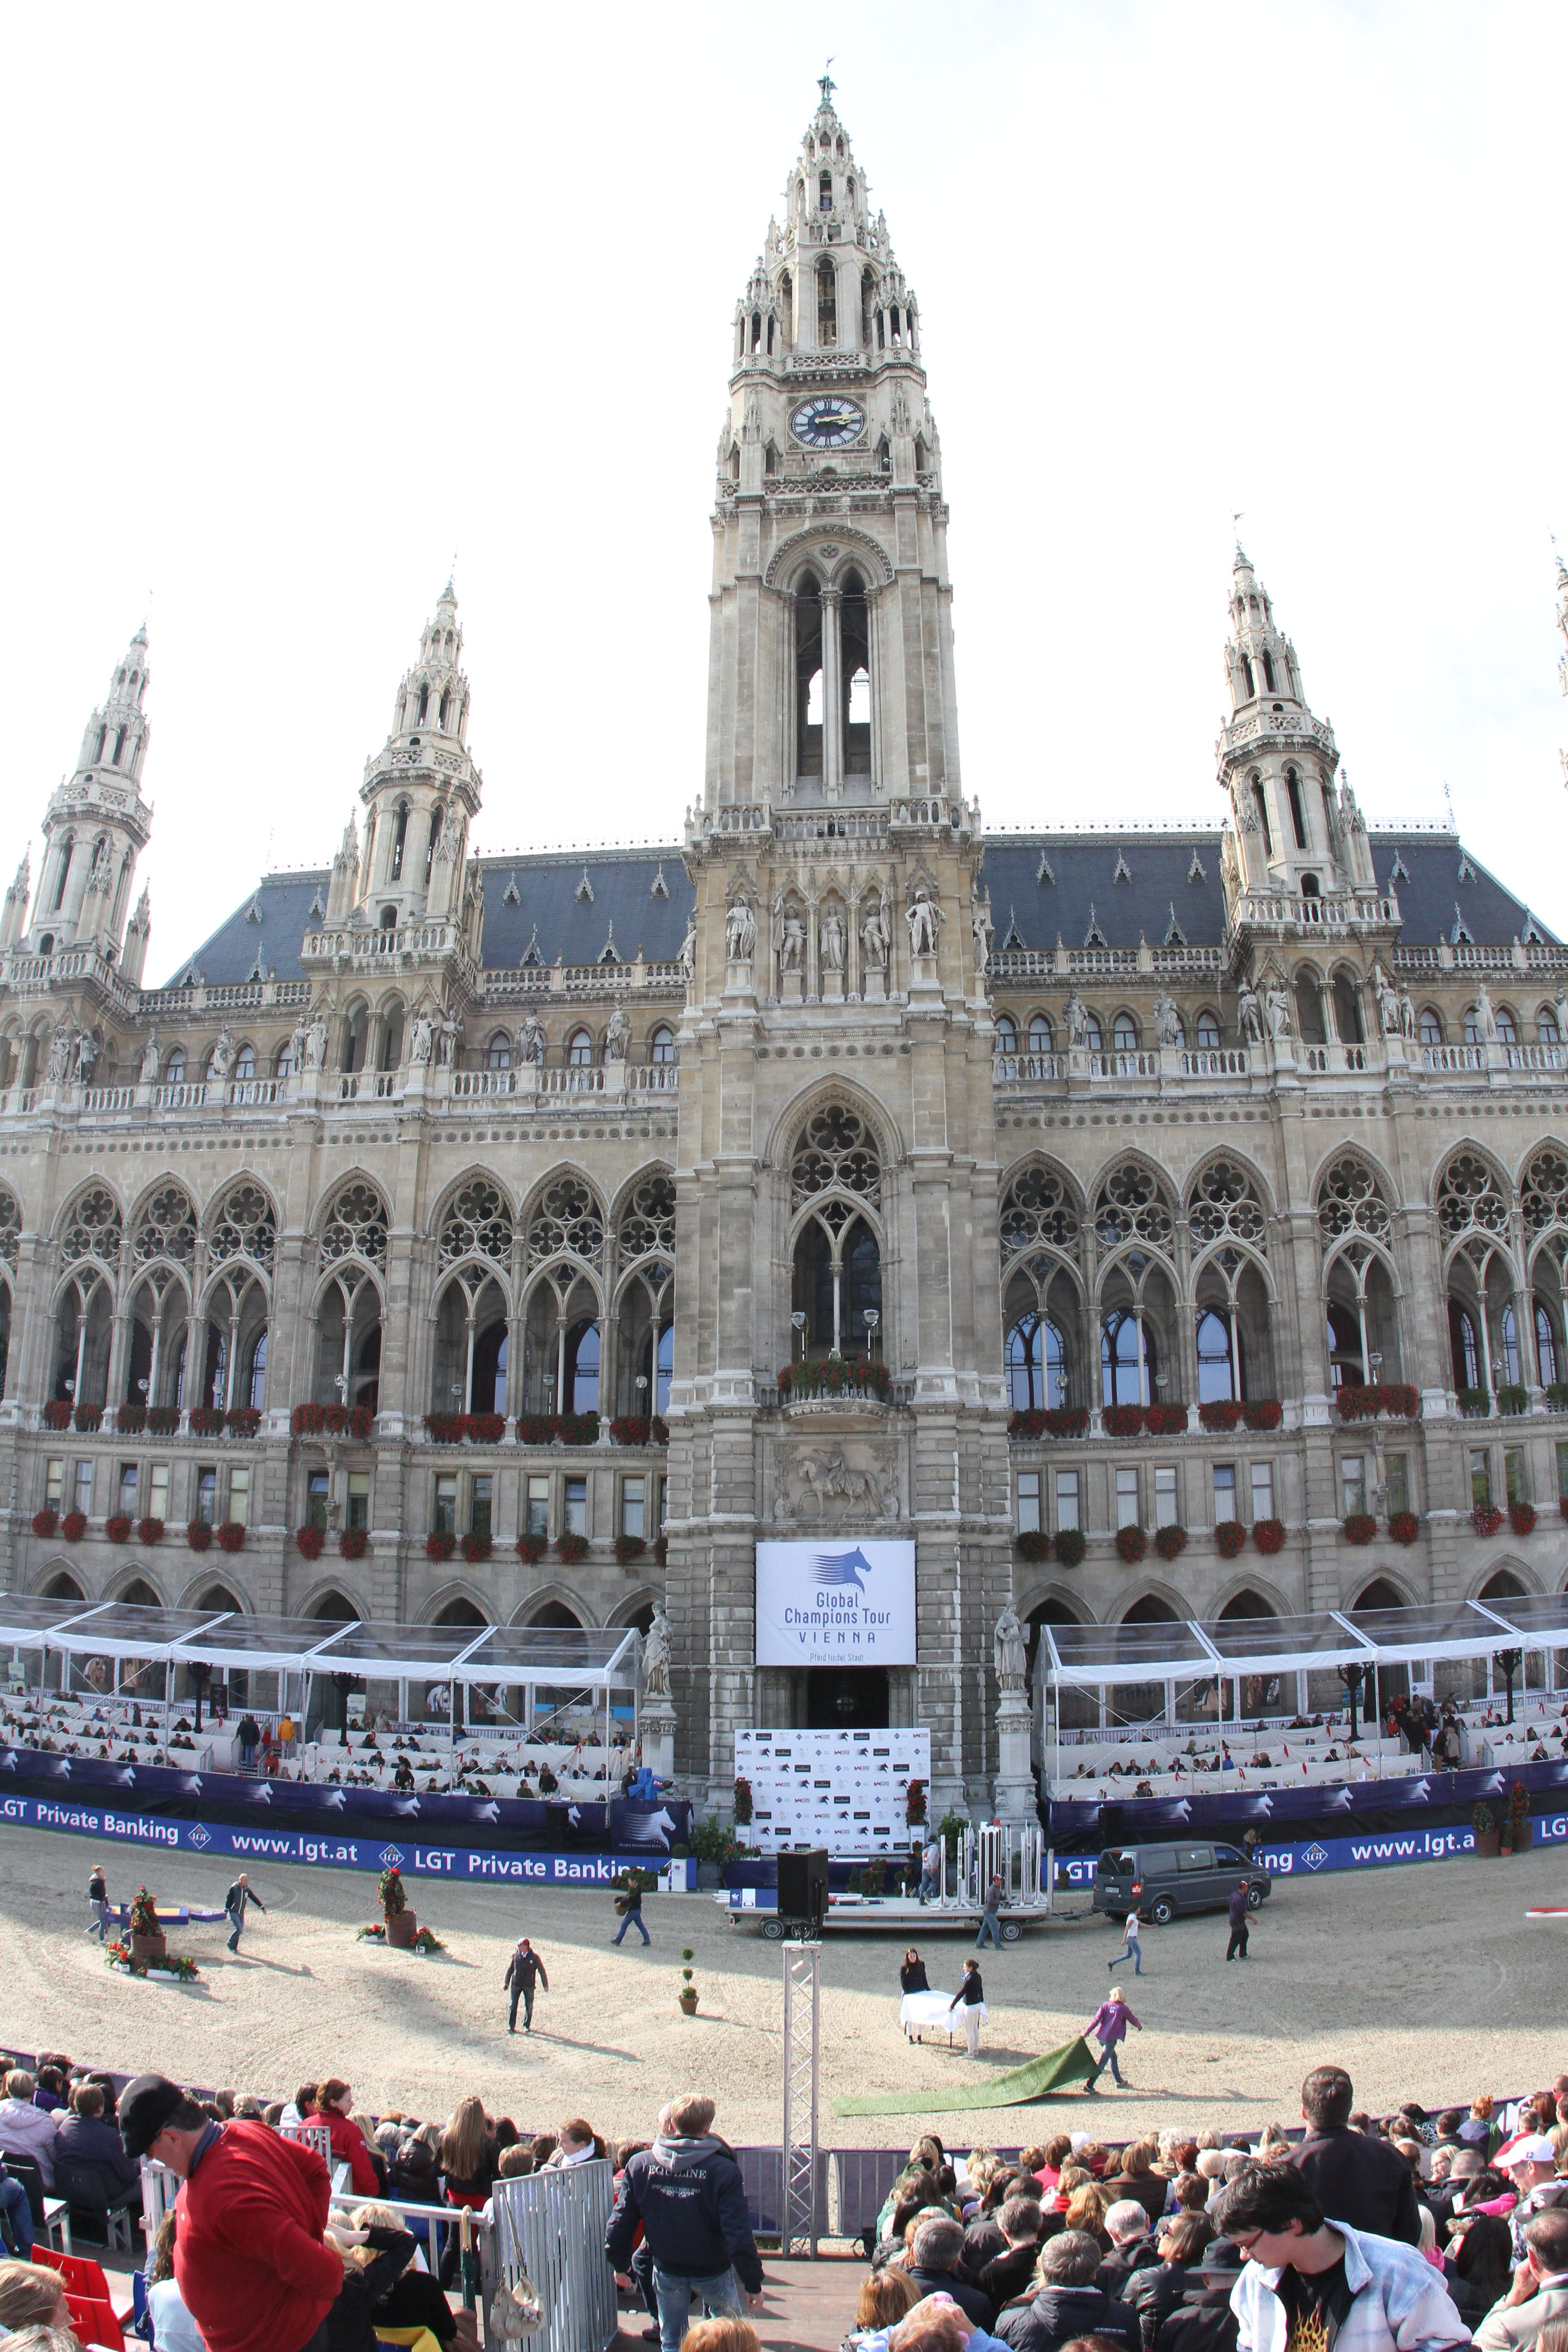 Gct Vienna Venue Is Stunning Vienna Longines Global Champions Tour Charleighscookies Equestrianlife Eque Global Champions Tour Equestrian Equestrian Life